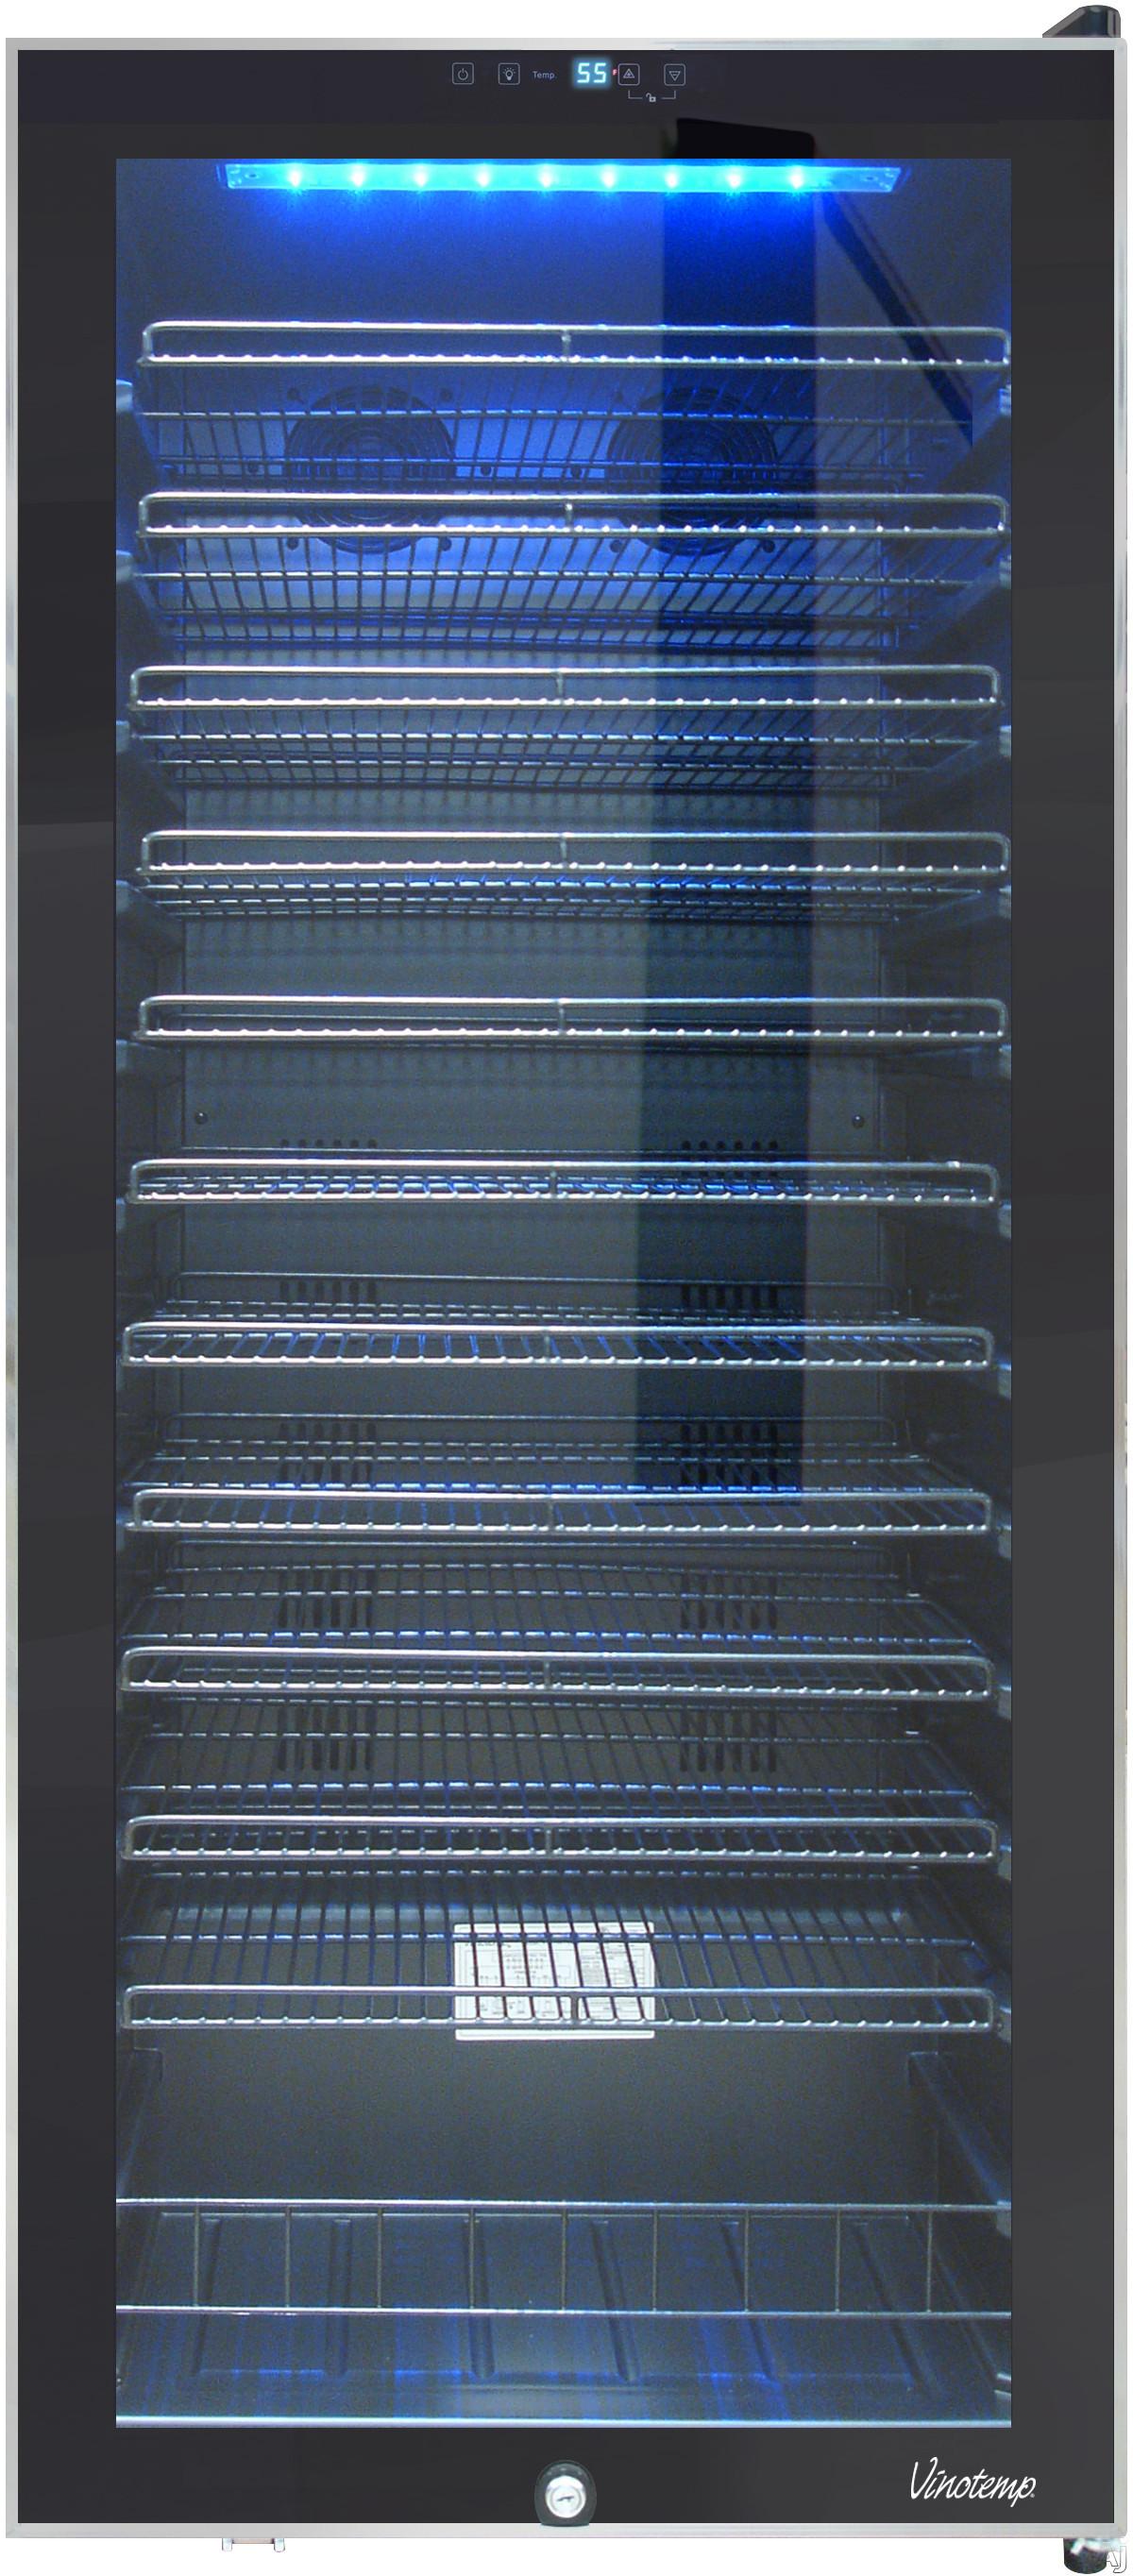 Vinotemp Butler Series VT100TSSB 24 Inch Wine Cooler with 99 Bottle Capacity Interior LED Lighting 11 Shelves Bulk Storage and Door Lock